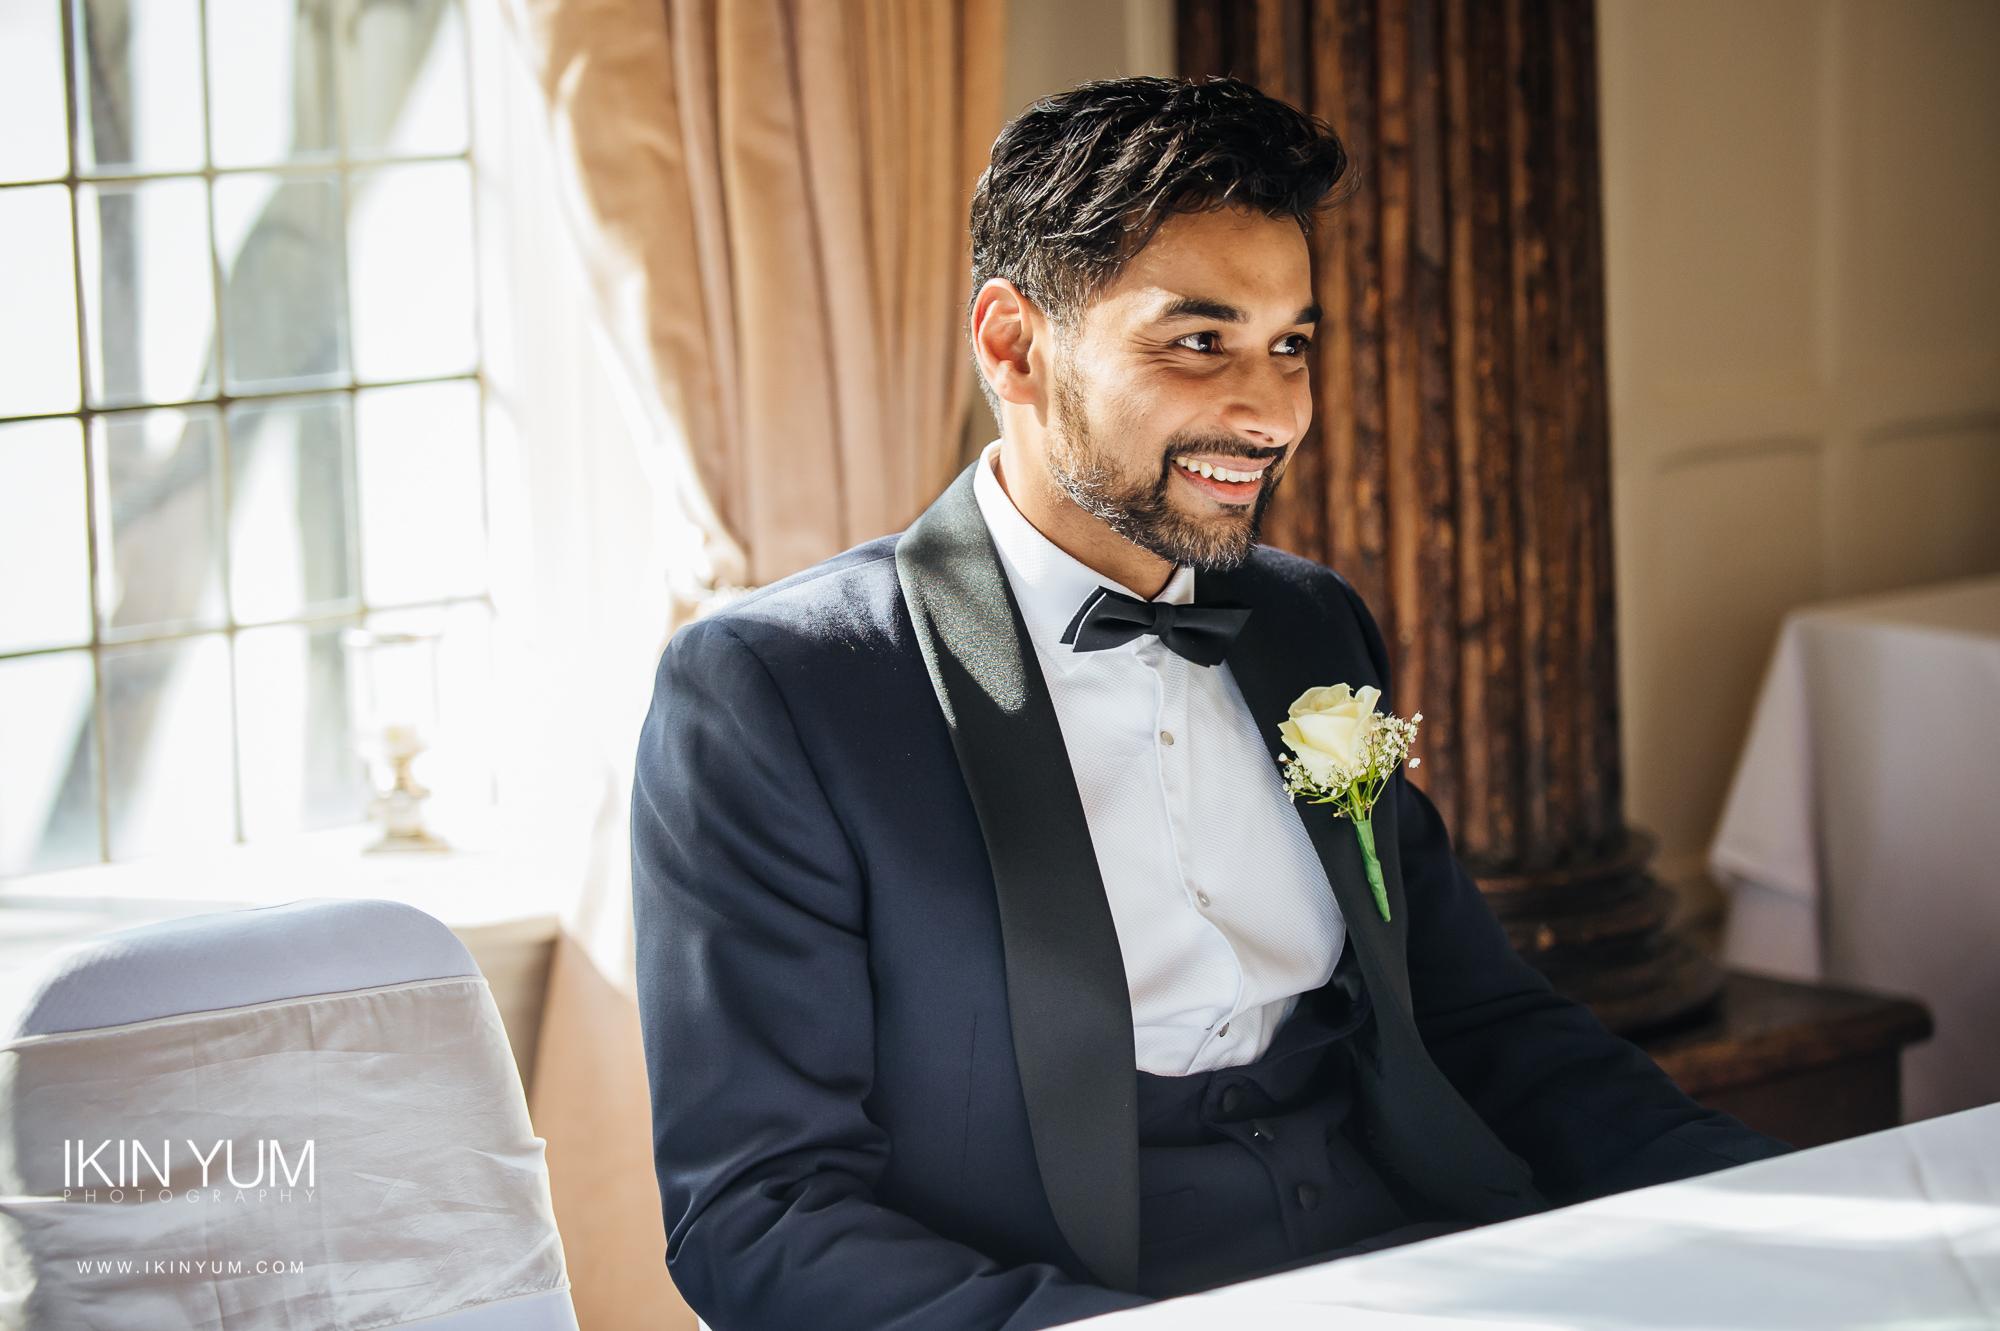 Laura Ashley Manor Wedding - Ikin Yum Photography-038.jpg